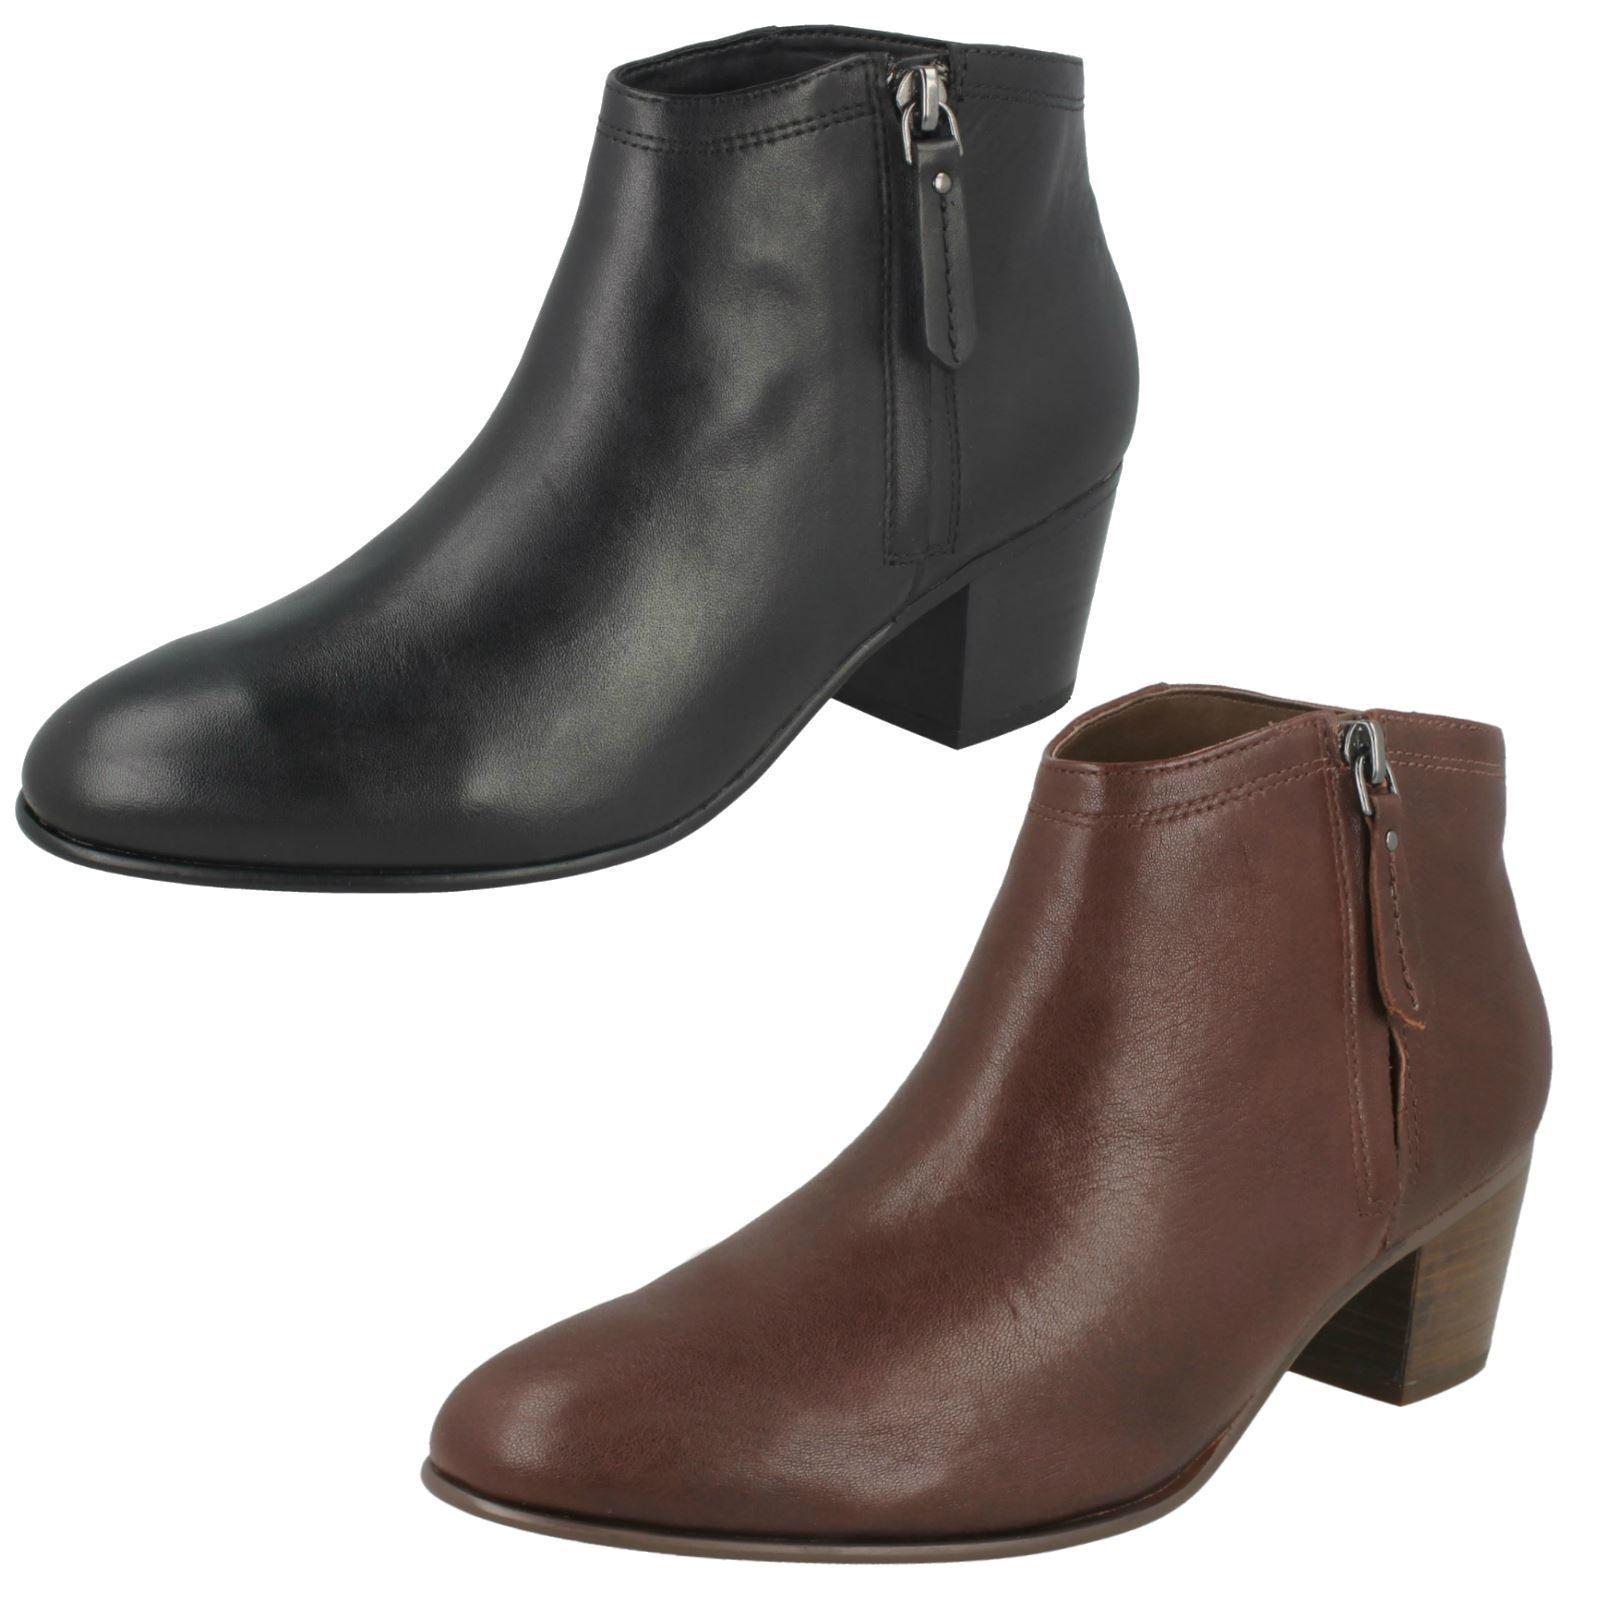 Damas Damas Damas Clarks maypearl Alice Caoba O Cuero Negro botas al tobillo  centro comercial de moda